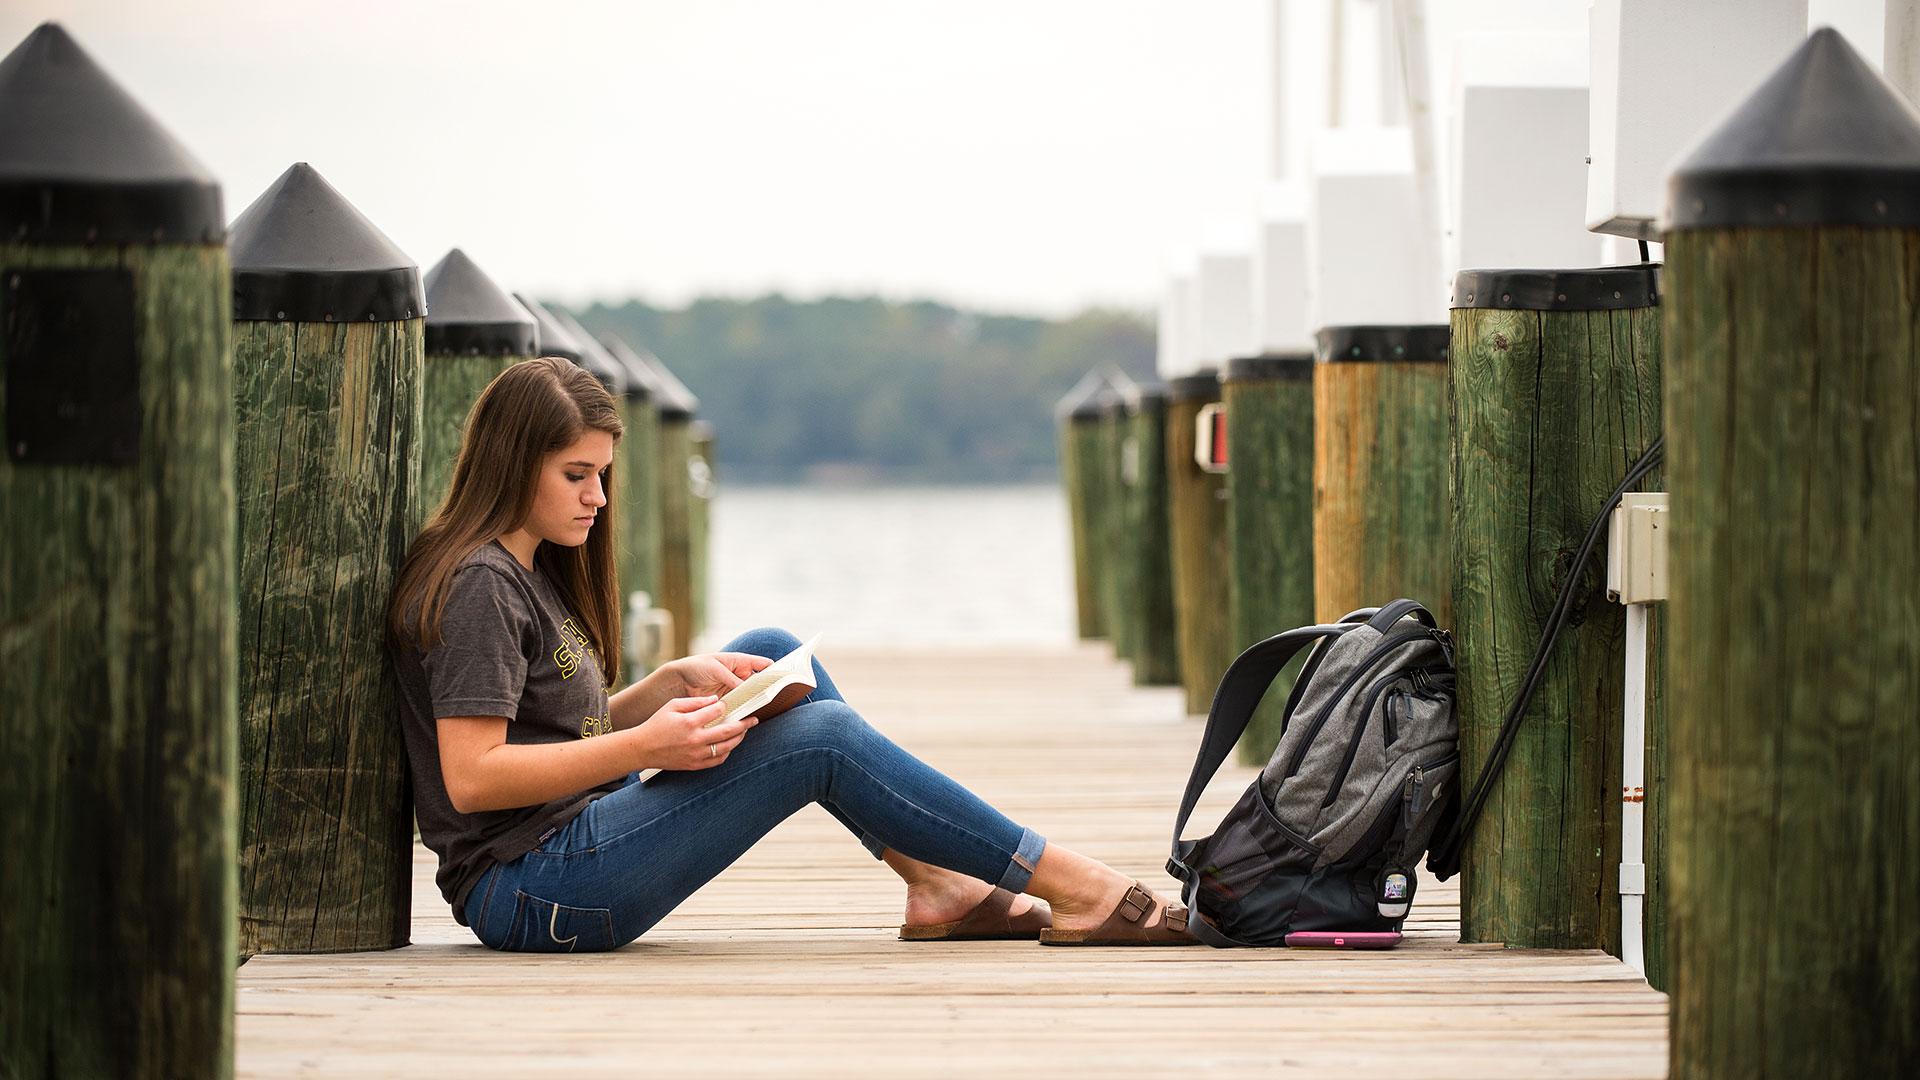 SMCM student studies on the riverfront dock.